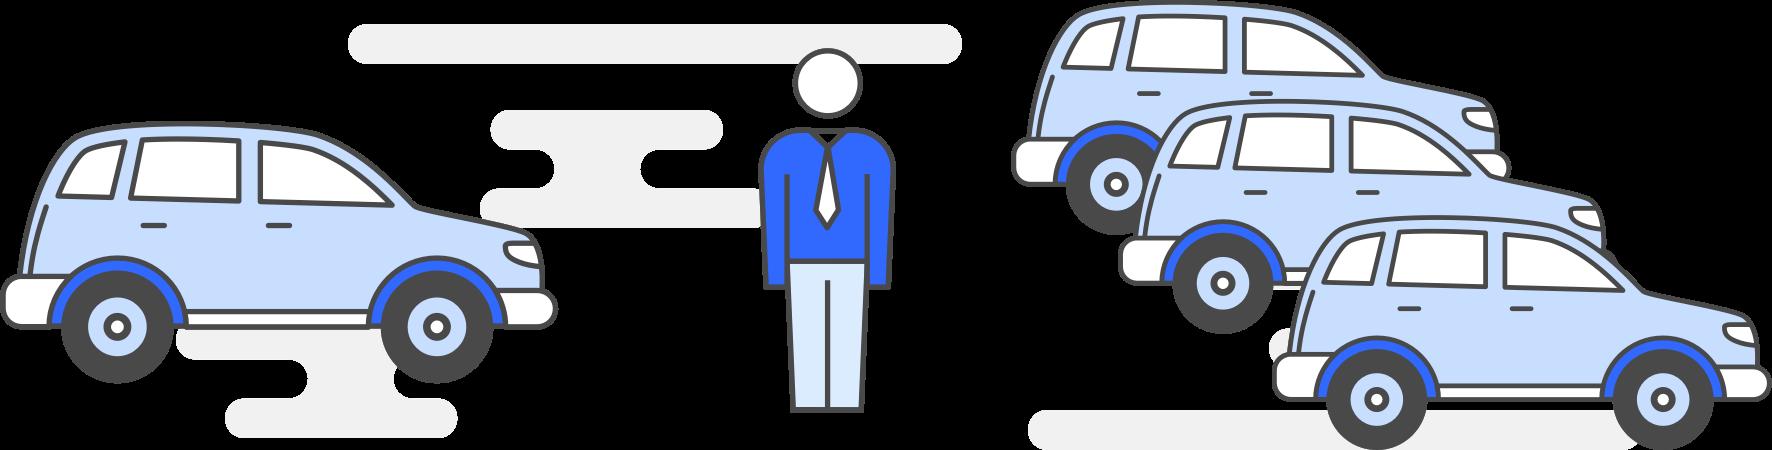 Business Car Finance Diagram